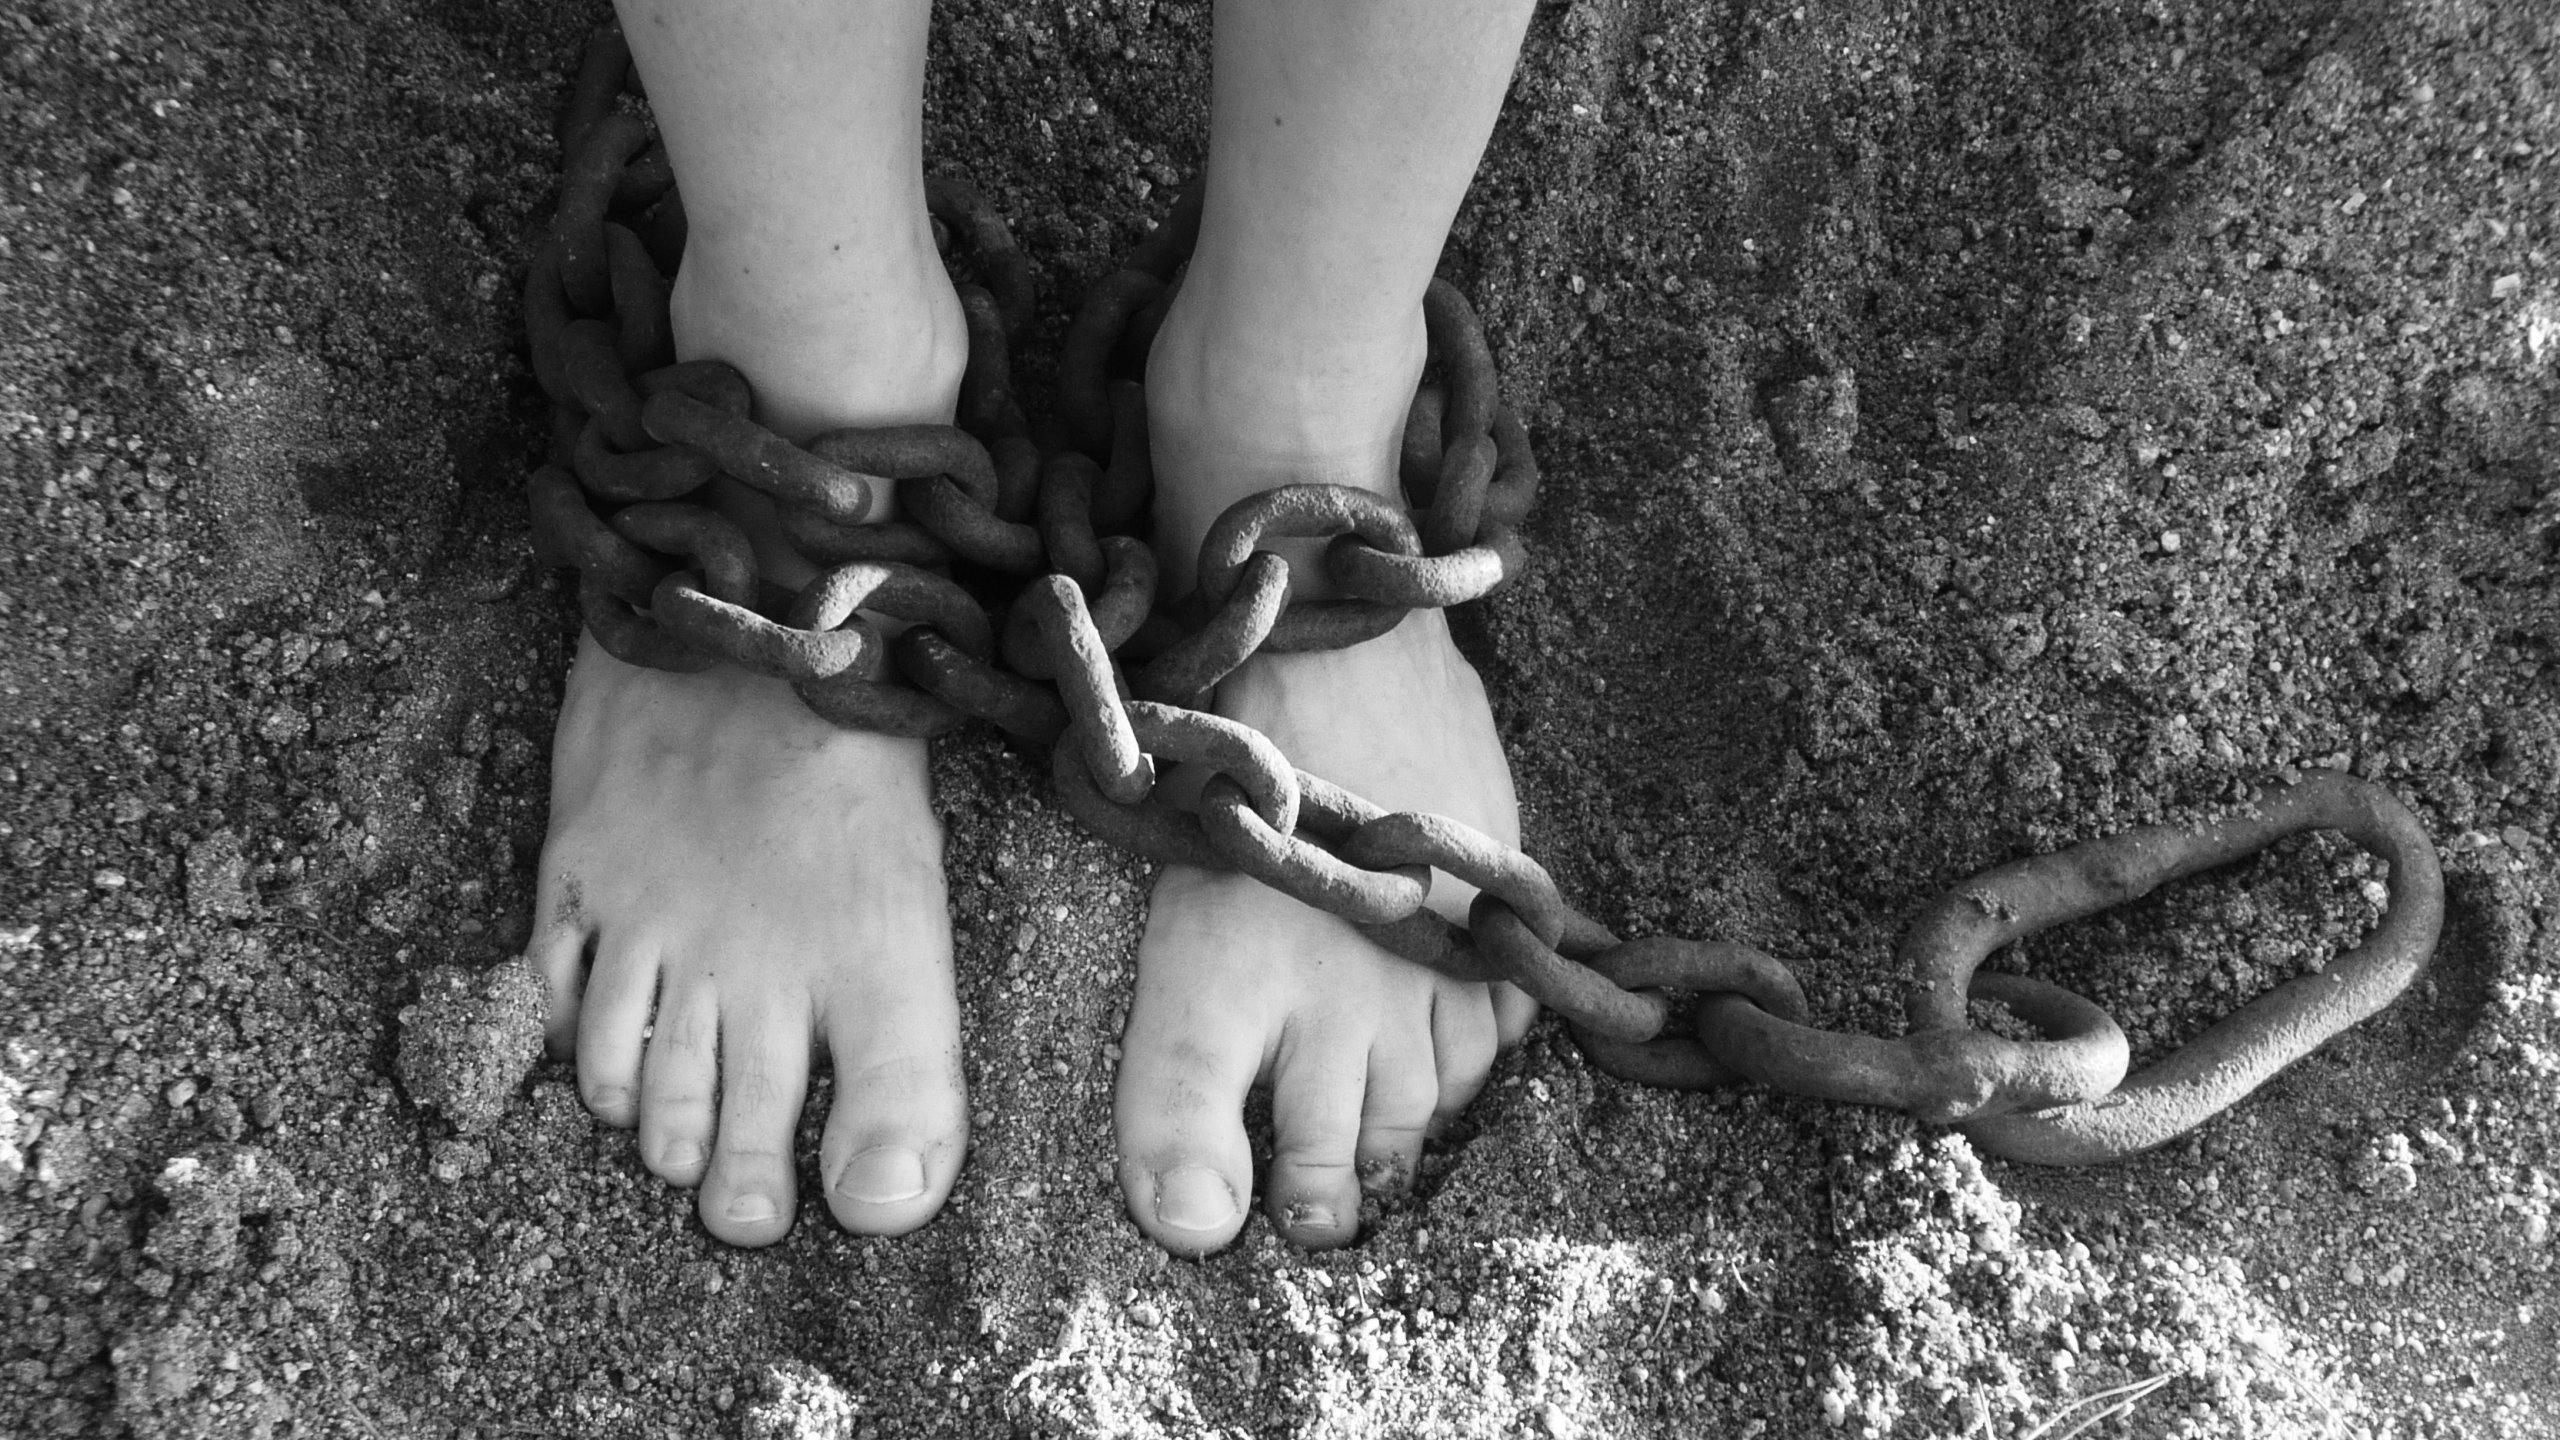 Chained captive feet